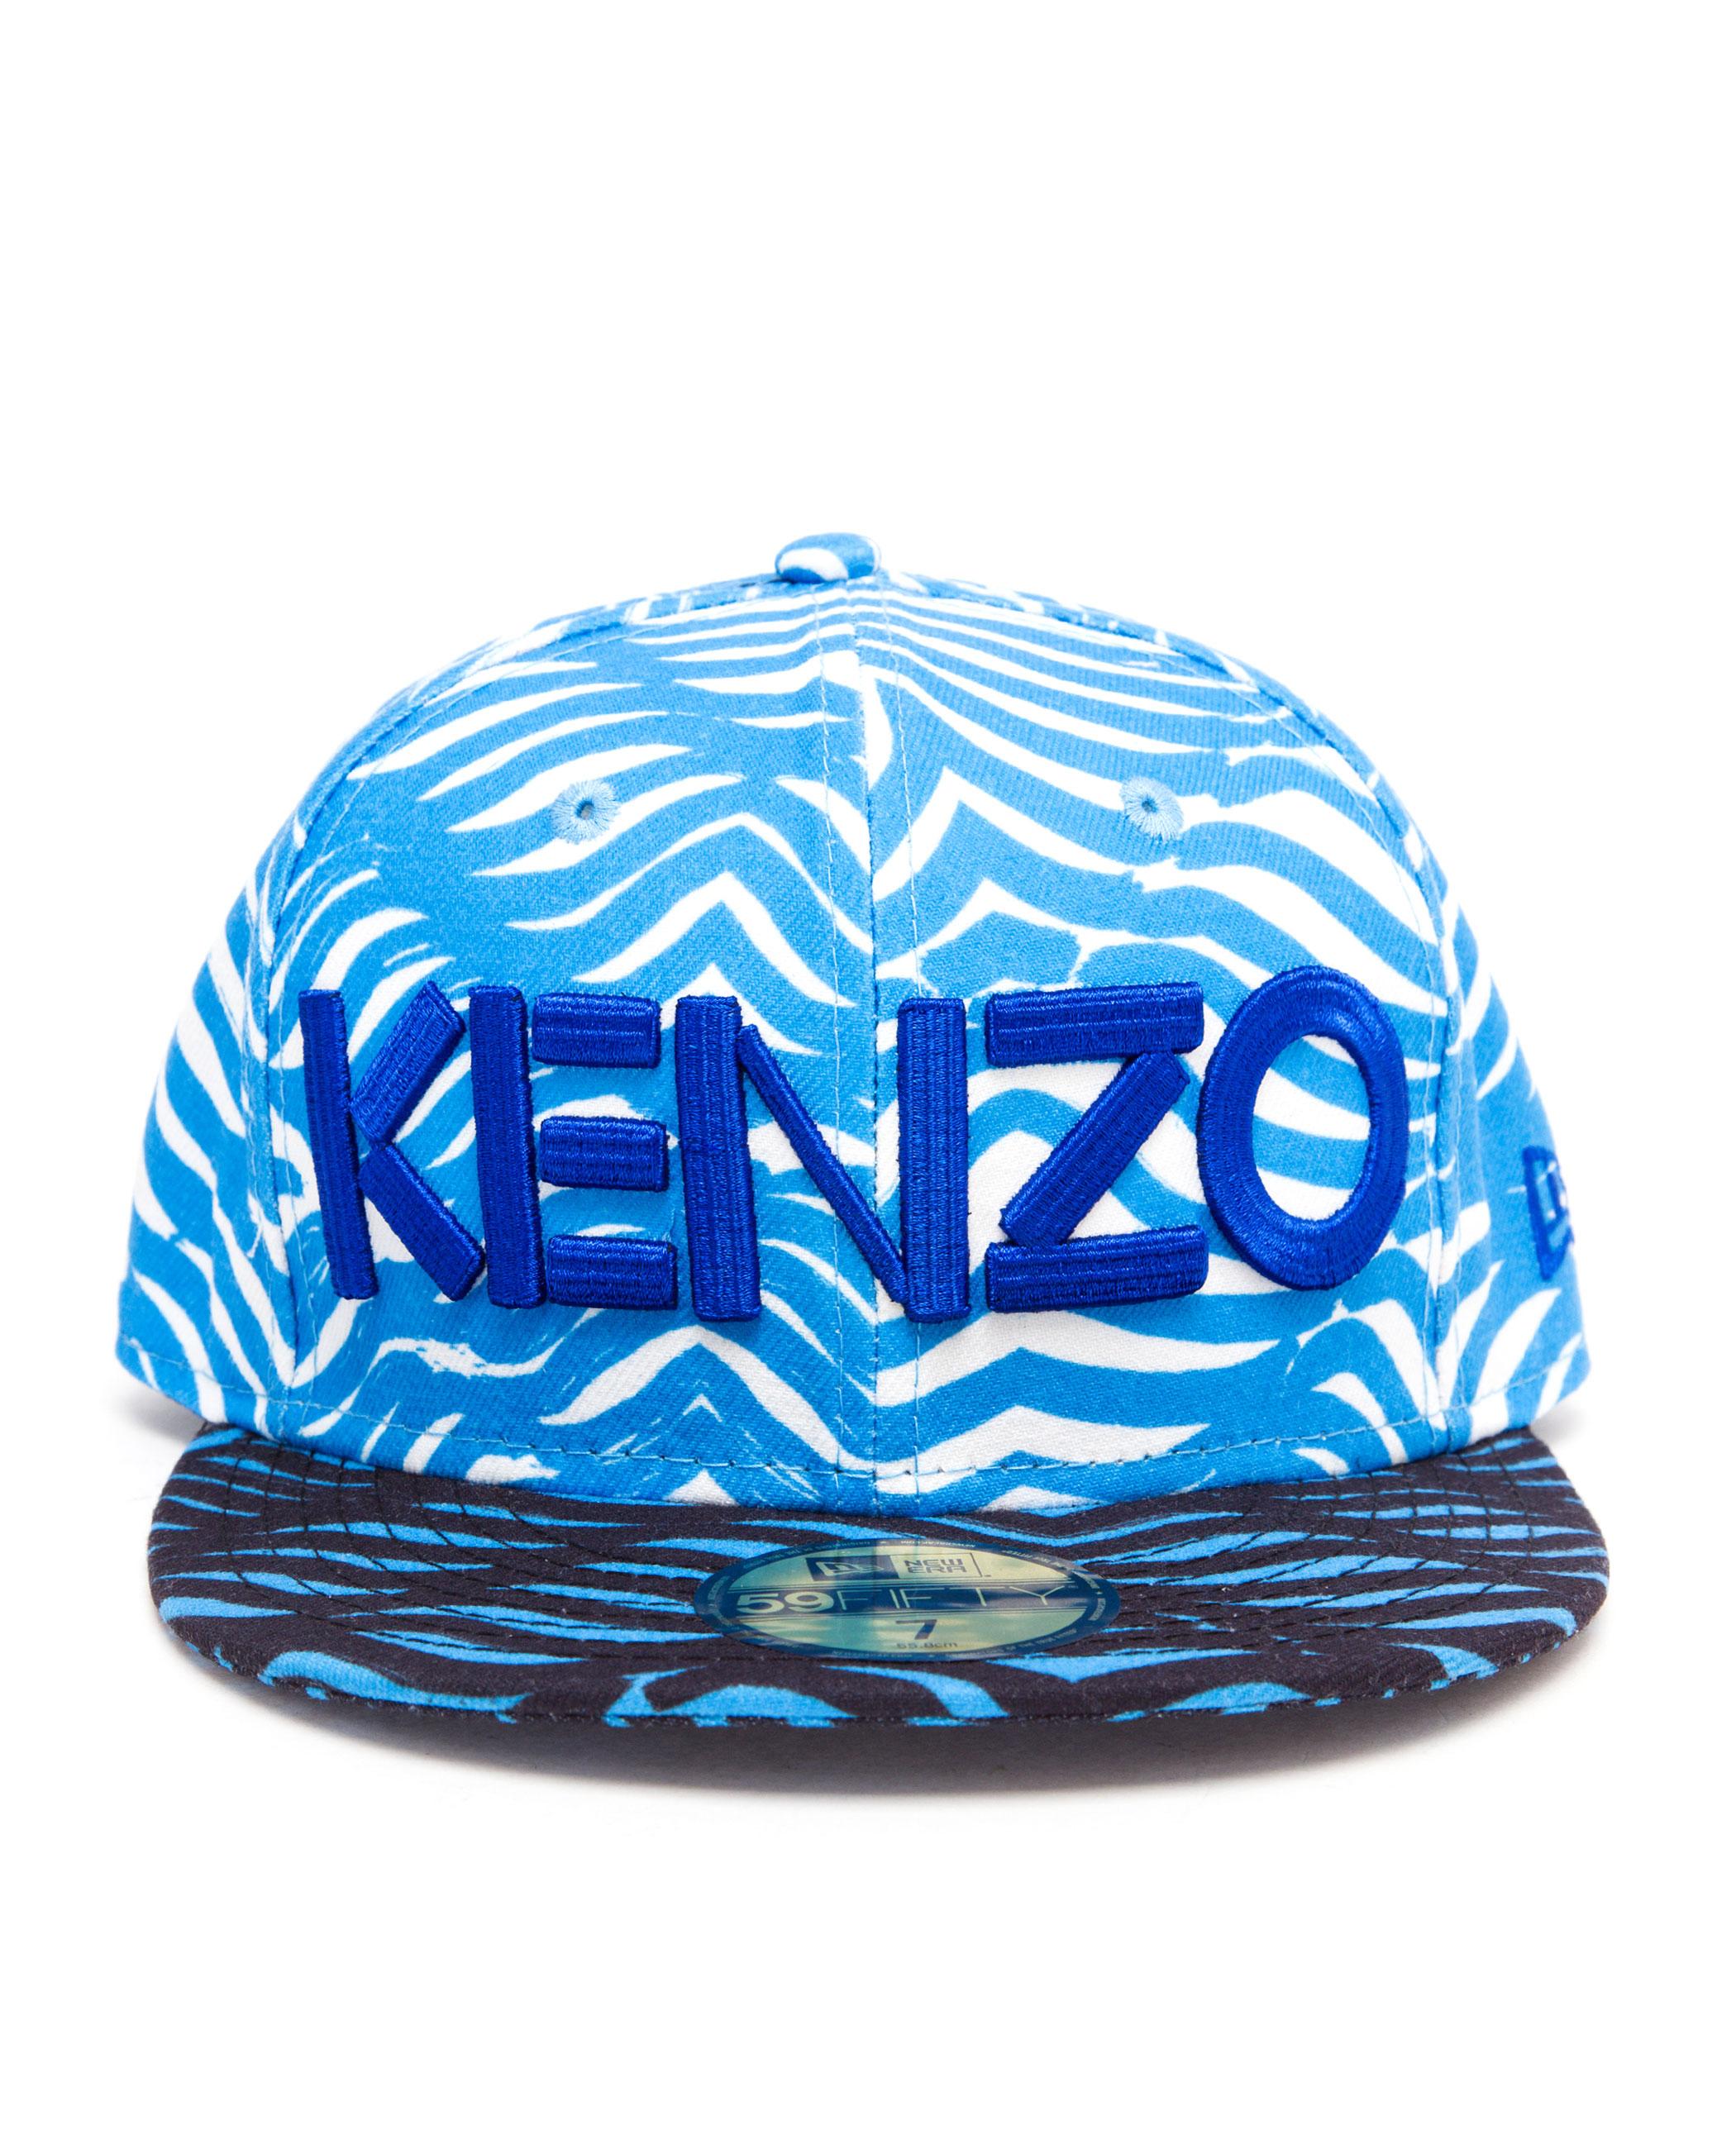 KENZO X New Era Zebra Printed Cap in Blue - Lyst 272eb2bdc356